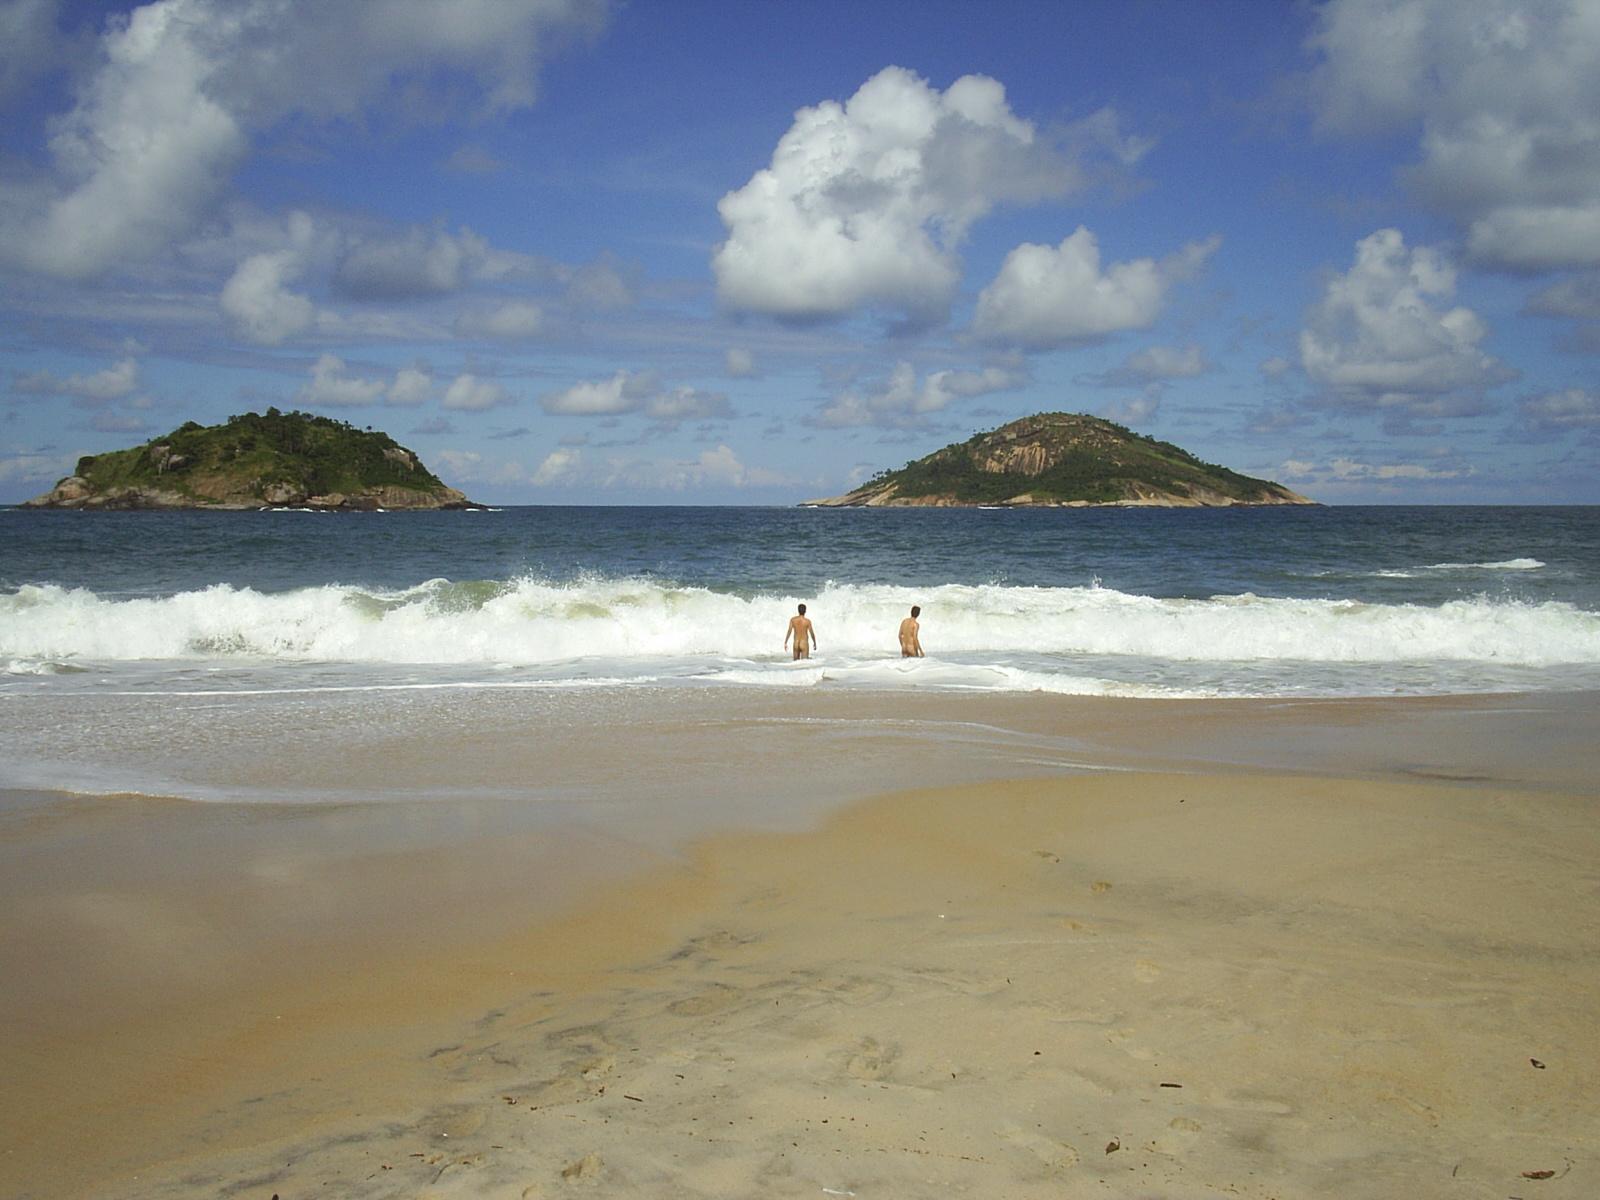 Estado do Rio de Janeiro terá sua primeira praia nudista